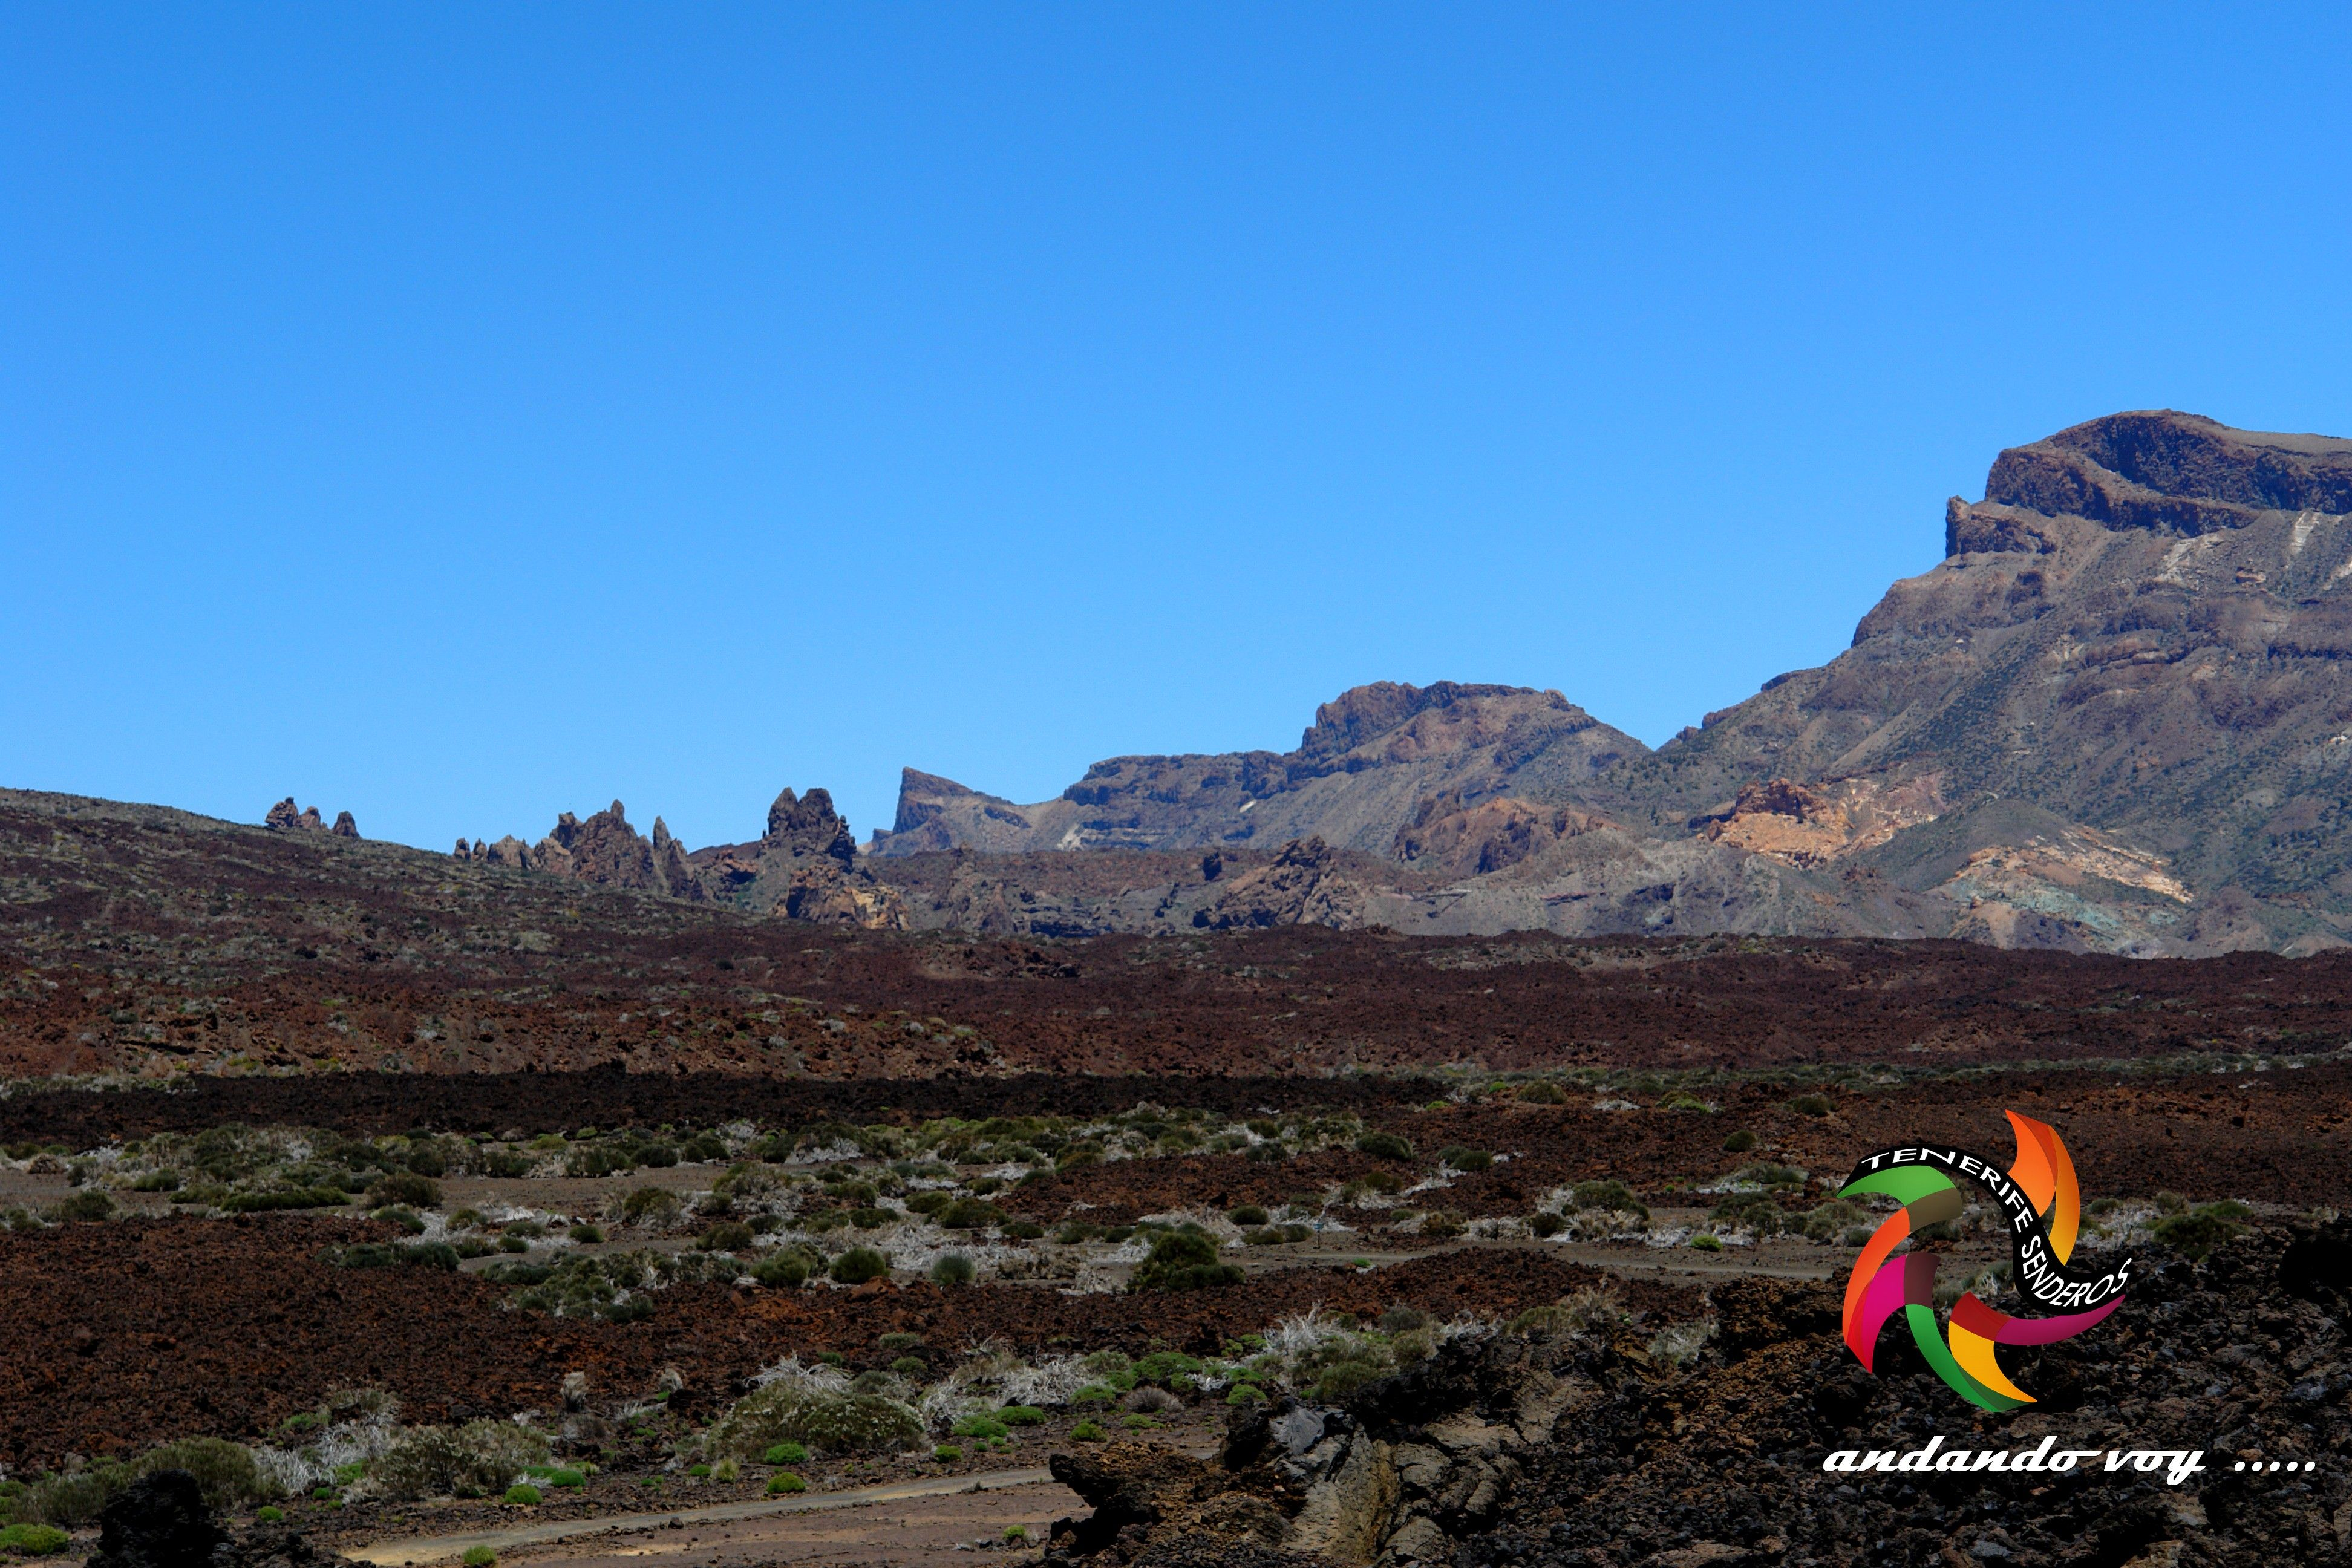 Circo de Las Cañadas #teide #tenerife #landscape #paisajes #hiking #hike #outdoors #senderismo